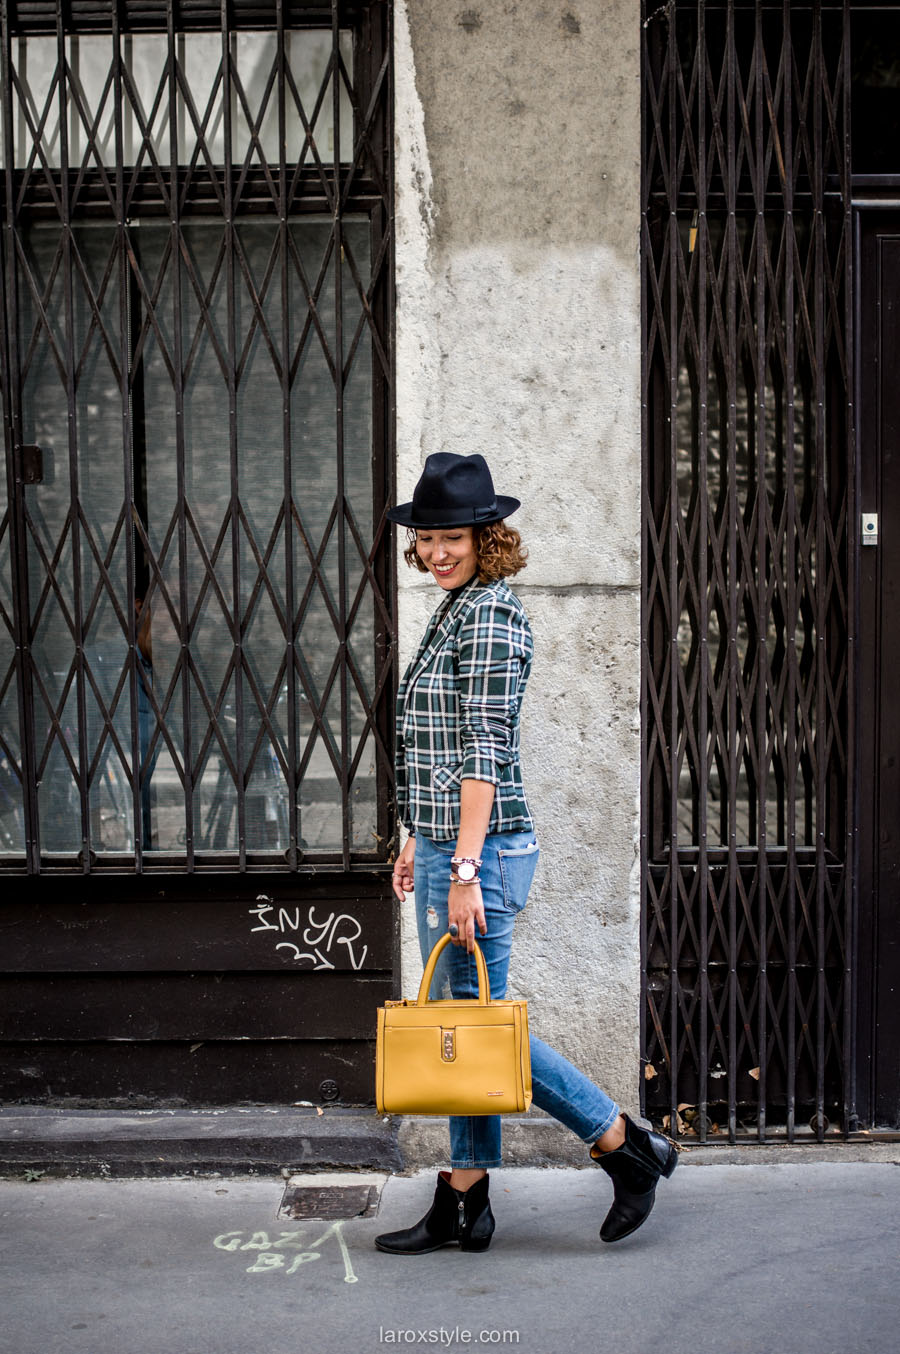 bristish style - veste a carreaux -sac dalery- laroxstyle blog mode lyon